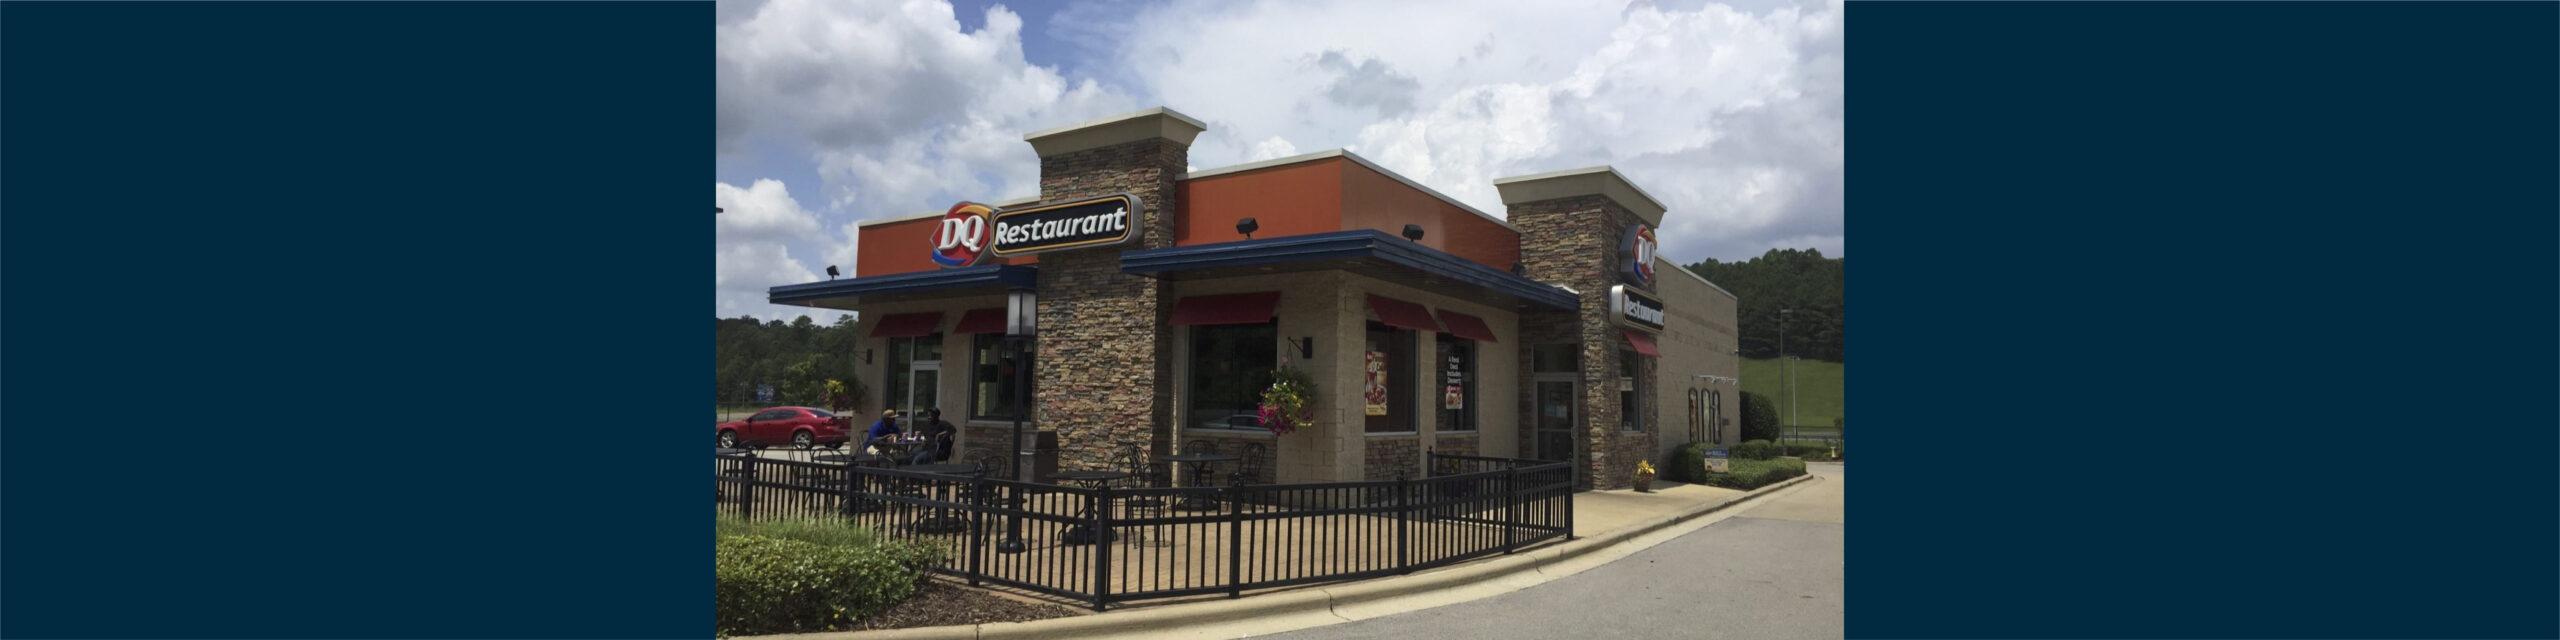 Birmingham (Liberty Park), AL Fourteen Foods DQ Restaurant